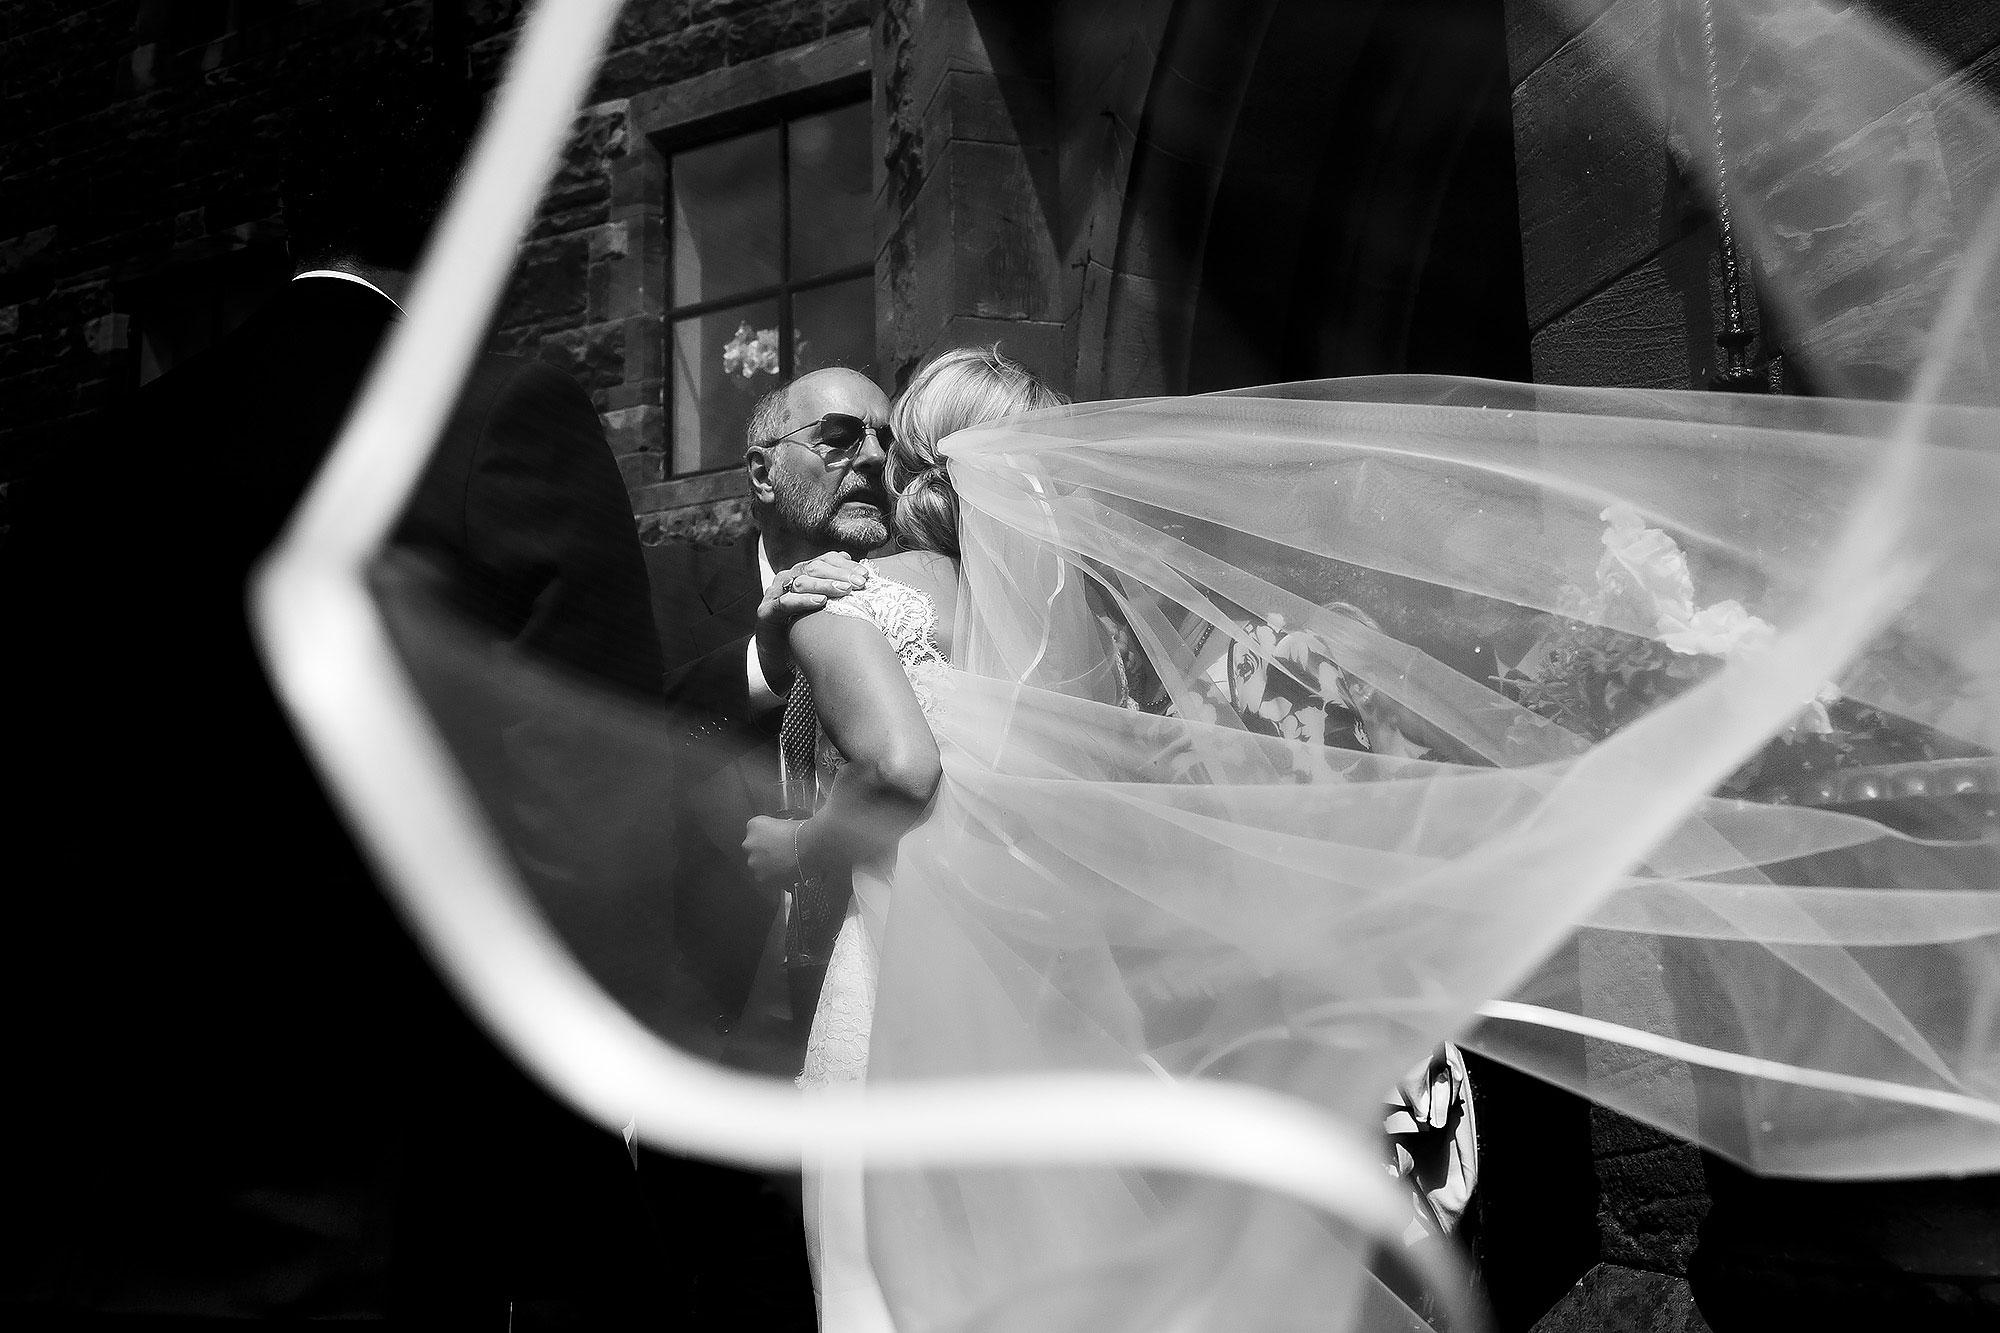 Bride hugging wedding guests outside Peckforton Castle as the veil flows around framing them | Peckforton Castle Wedding by Toni Darcy Photography